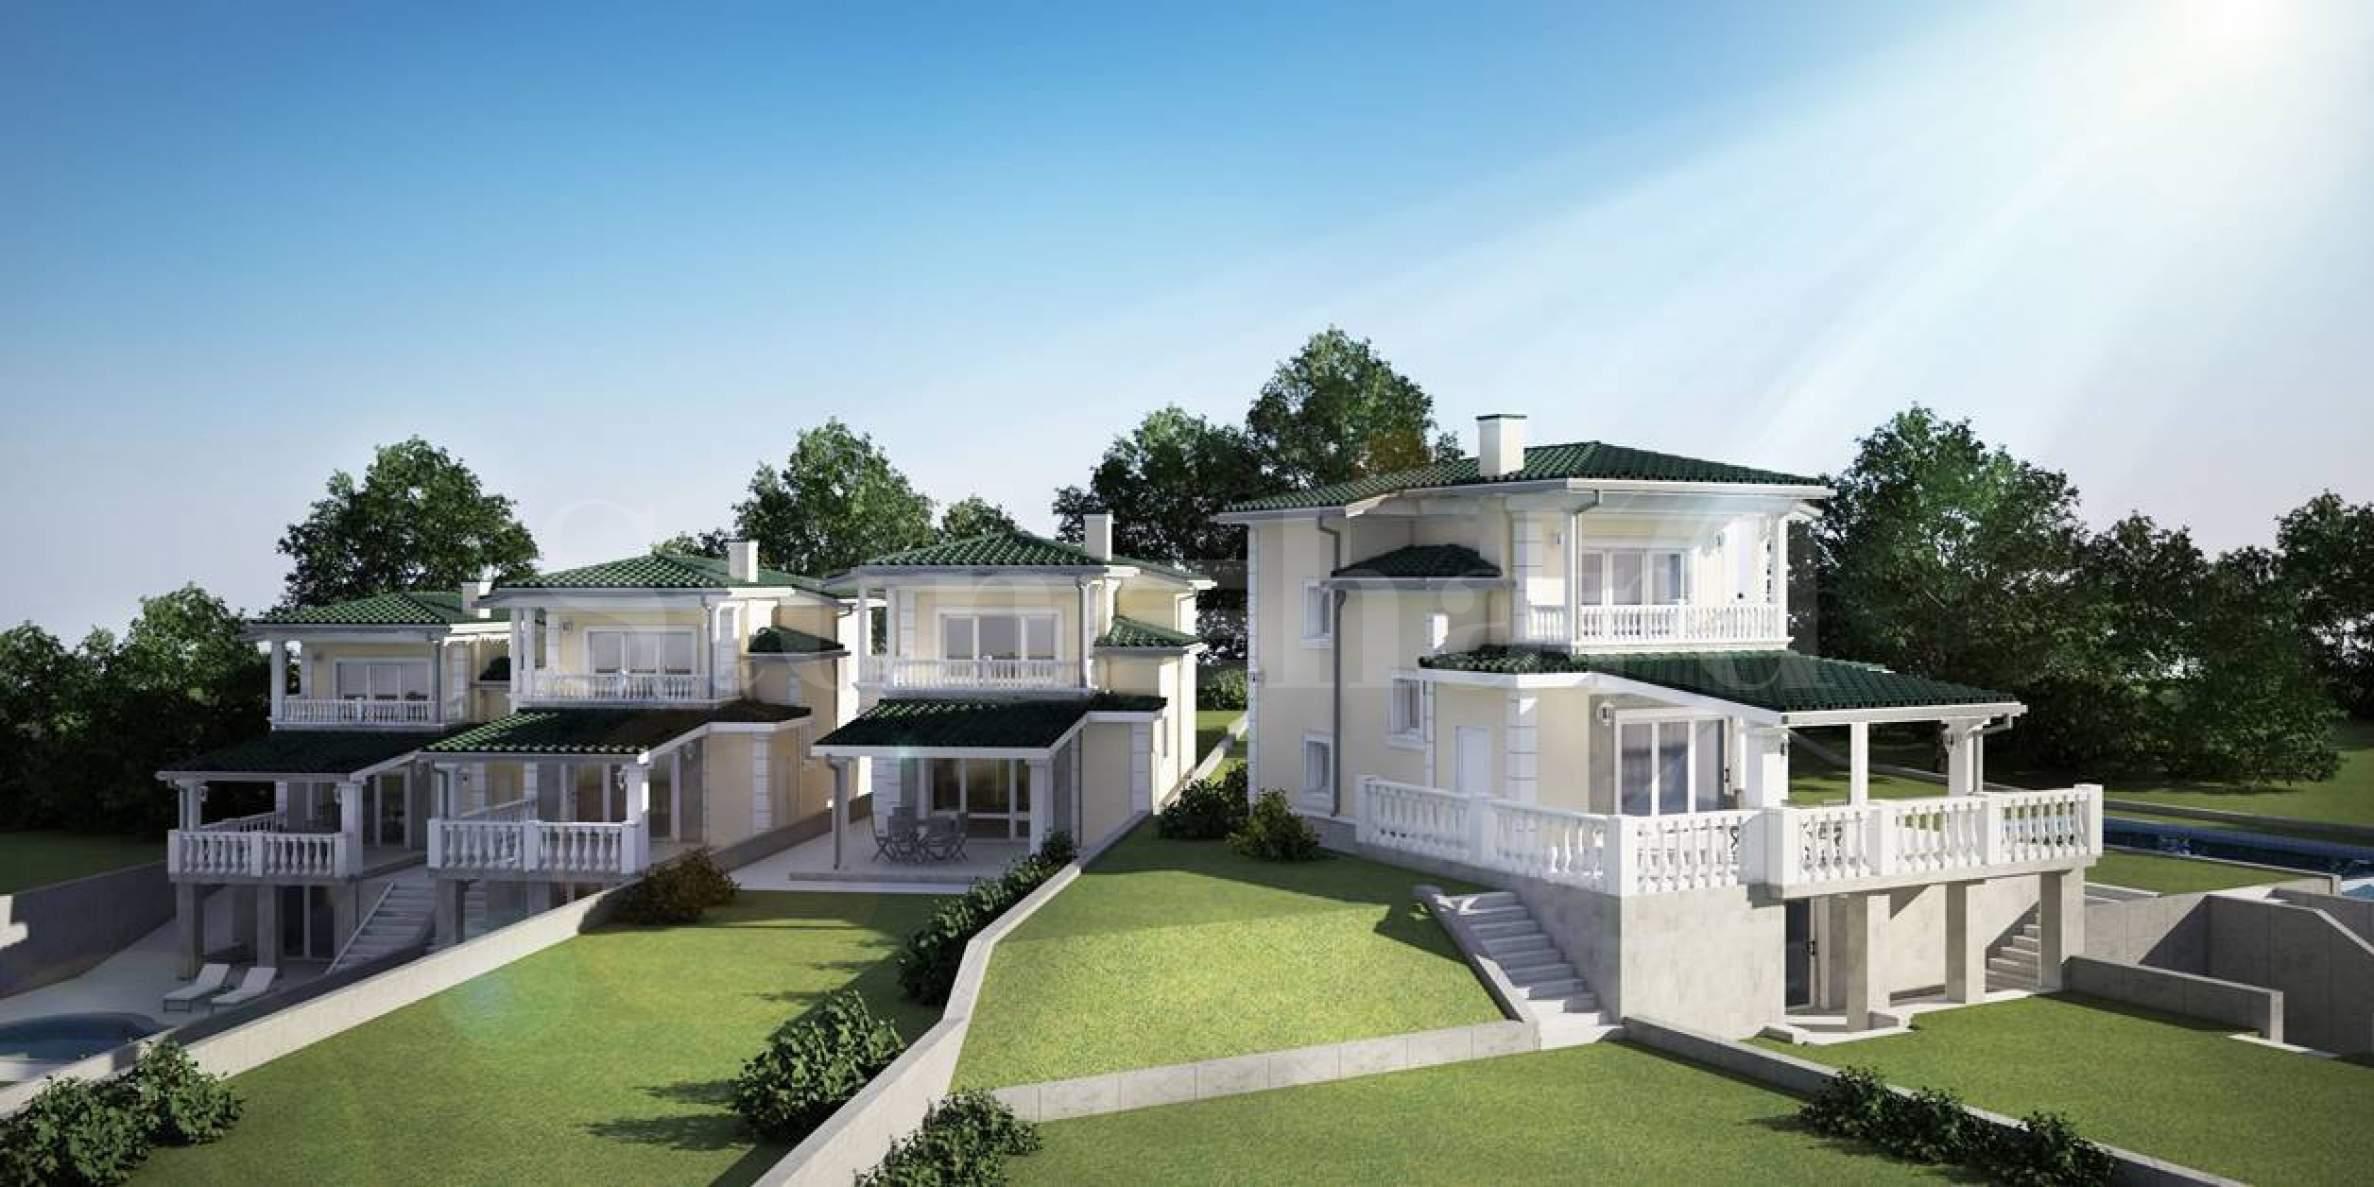 Brand new villas with pools & sea views1 - Stonehard